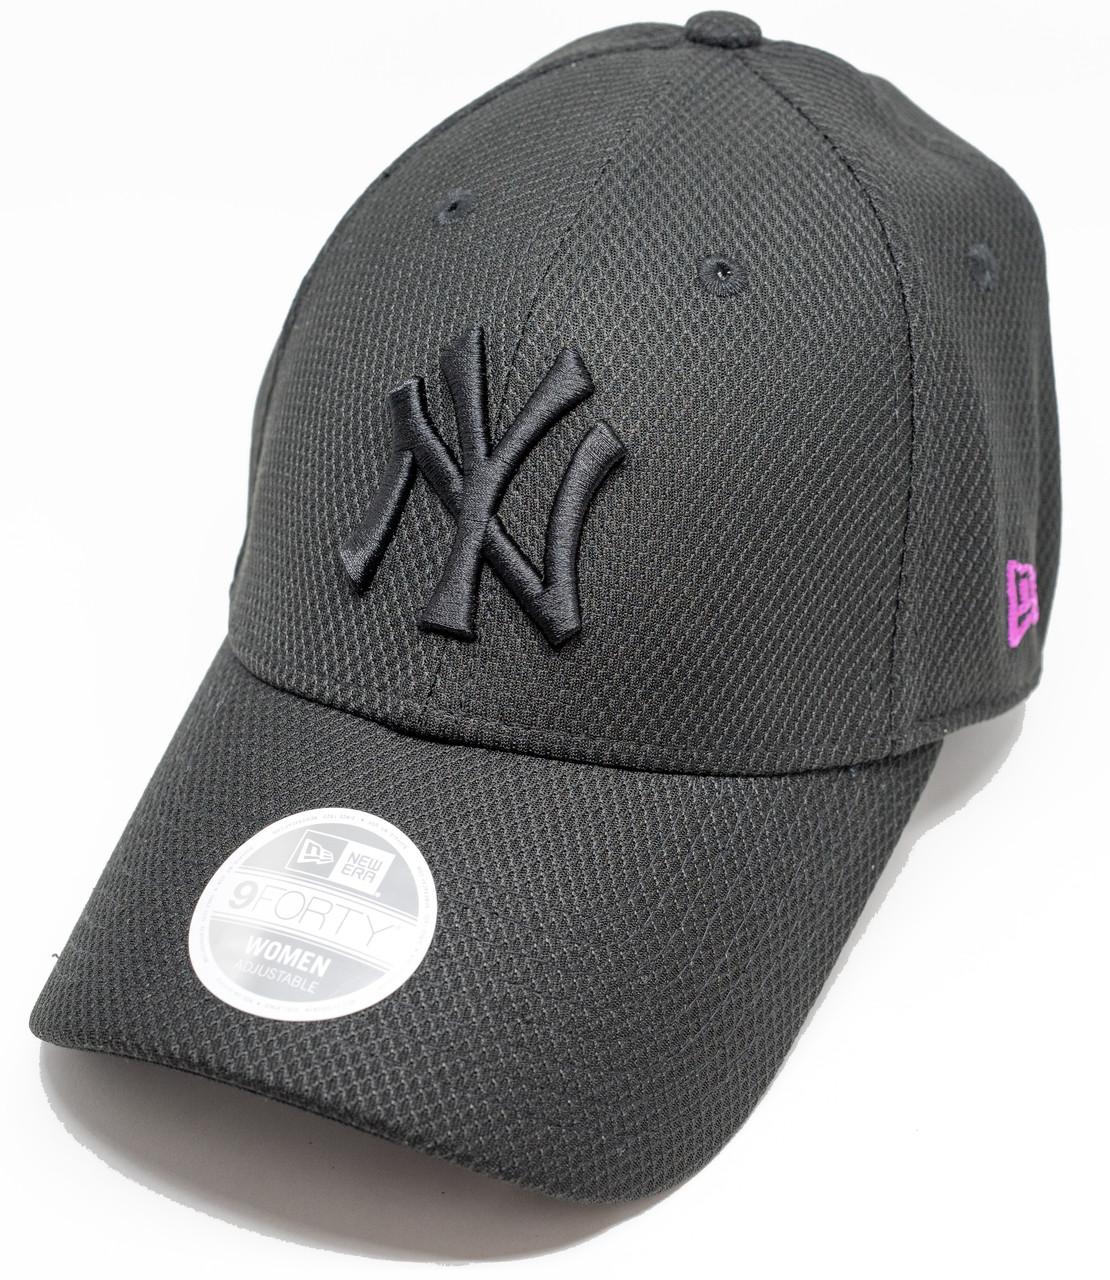 36535a5c9713a New Era 9Forty Neon Pop New York Yankees Cap Black Pink